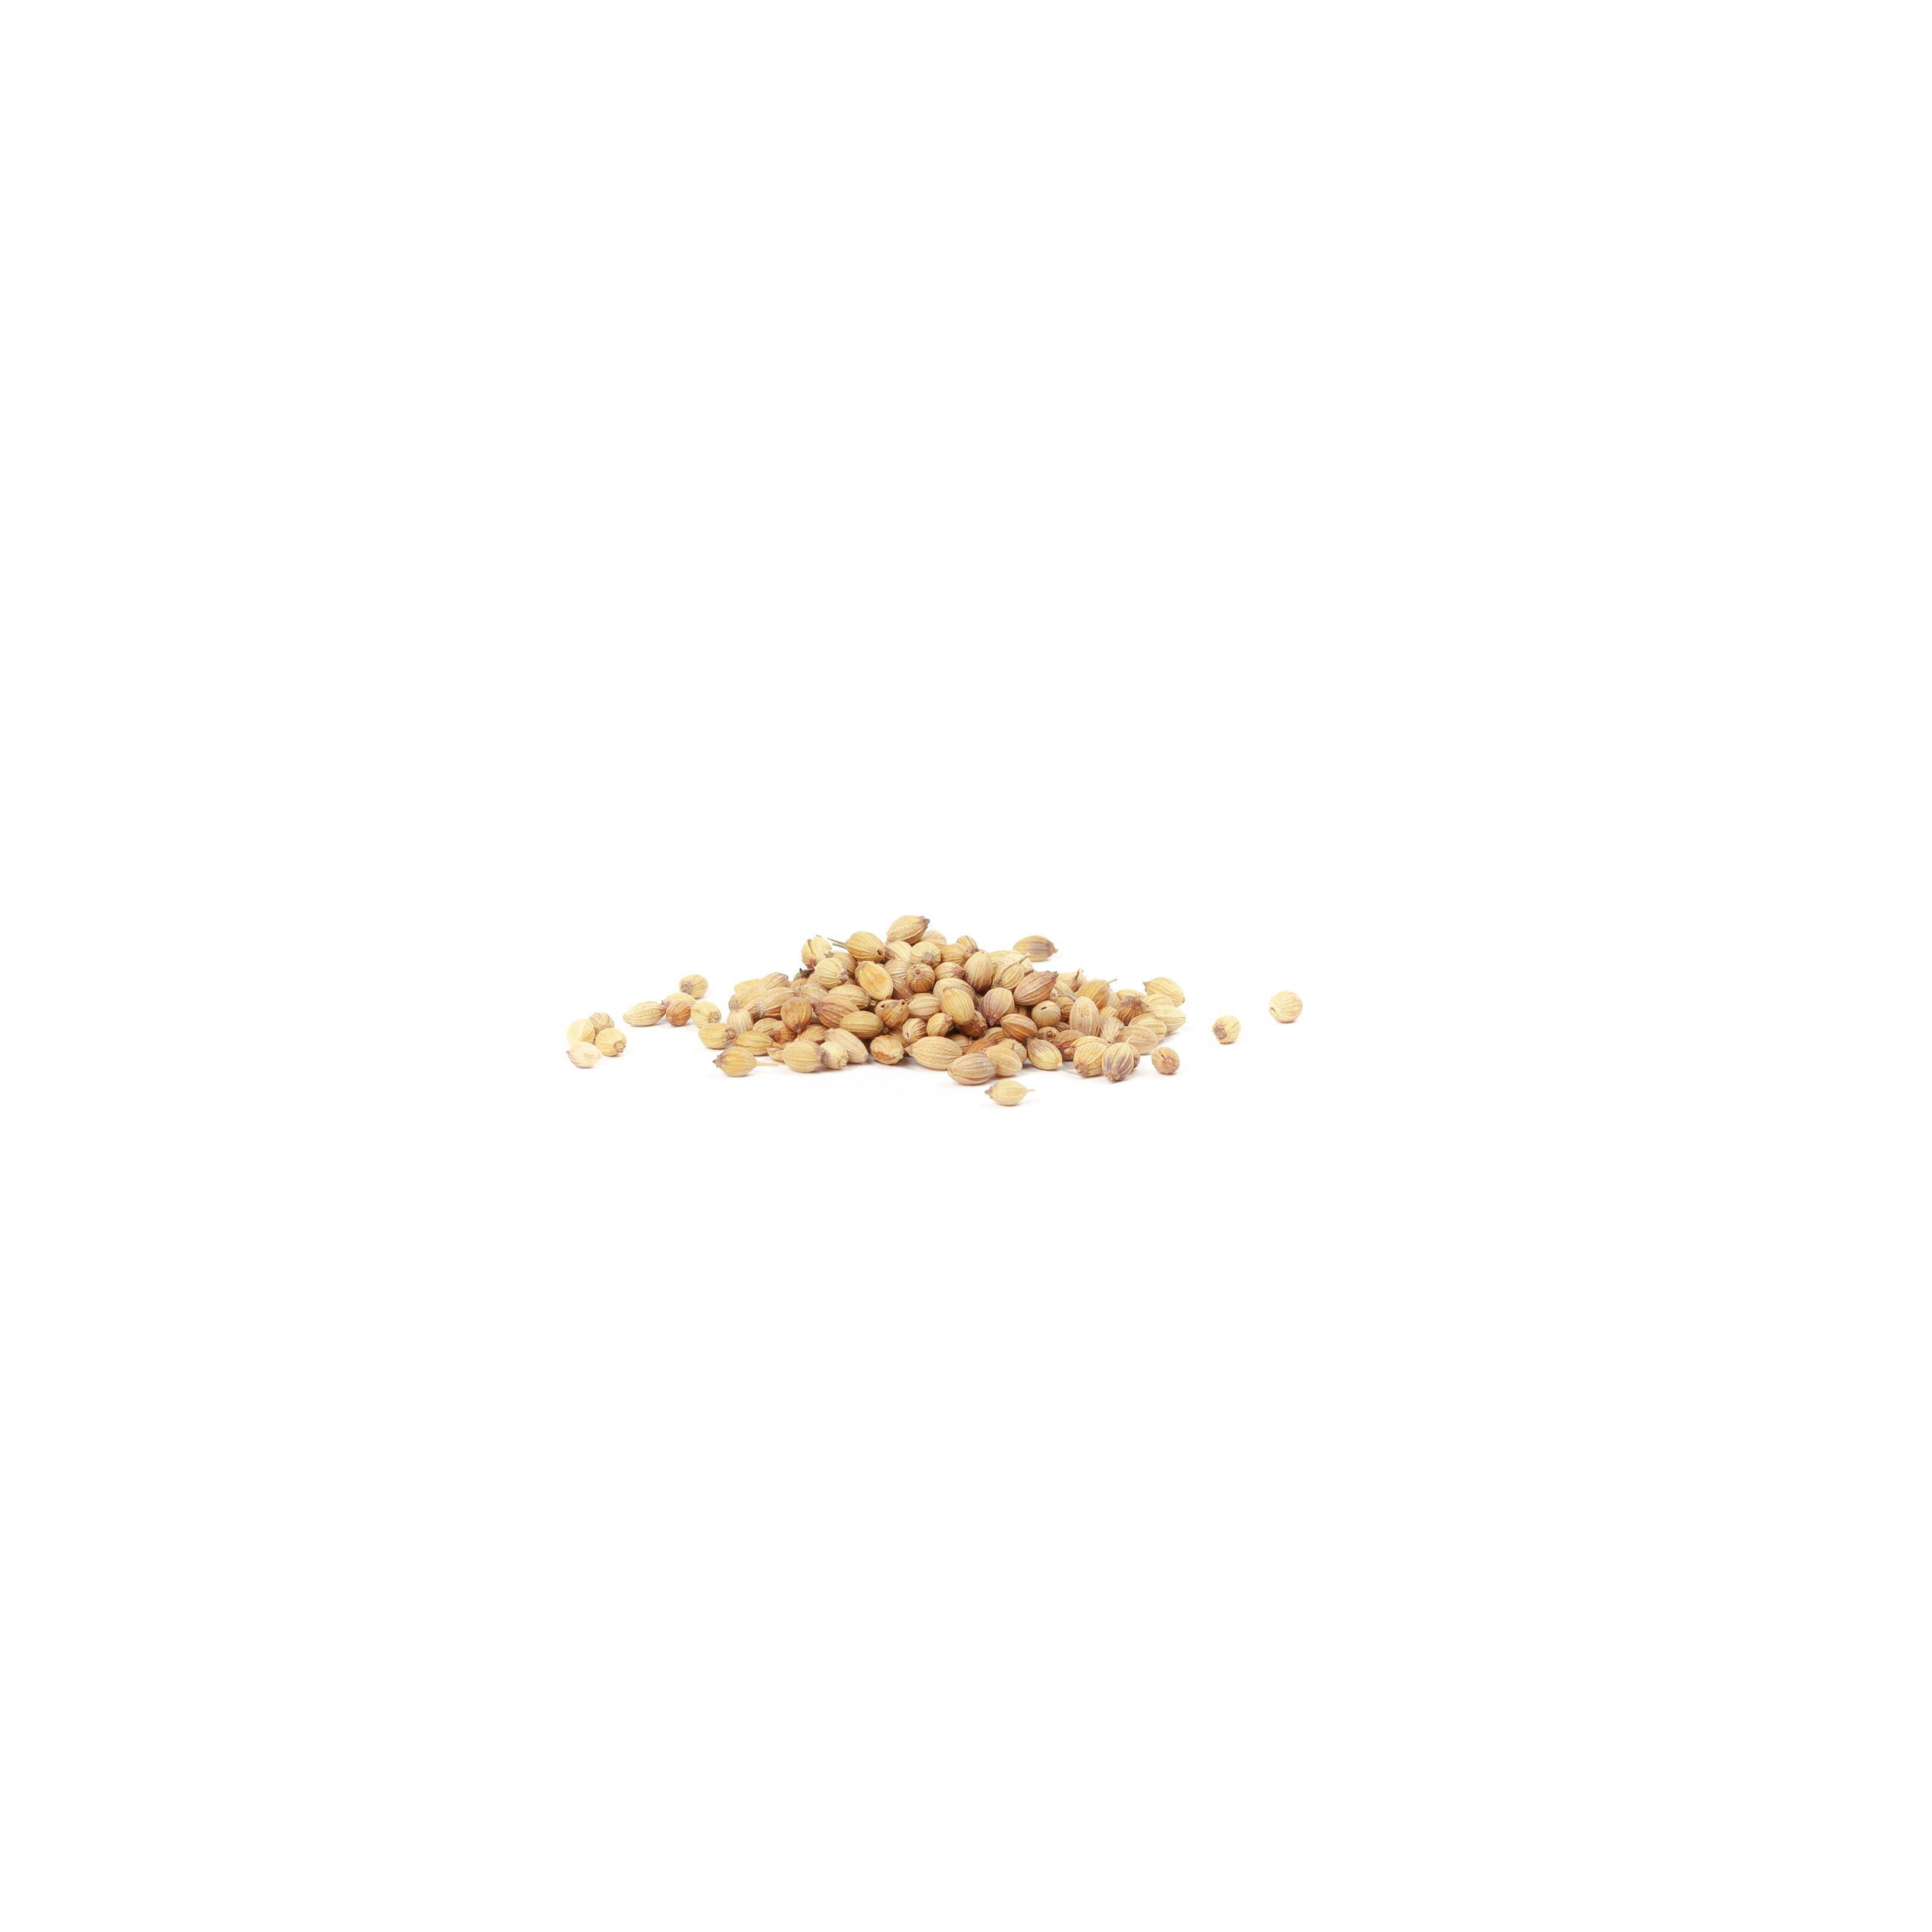 Coriander: Seeds